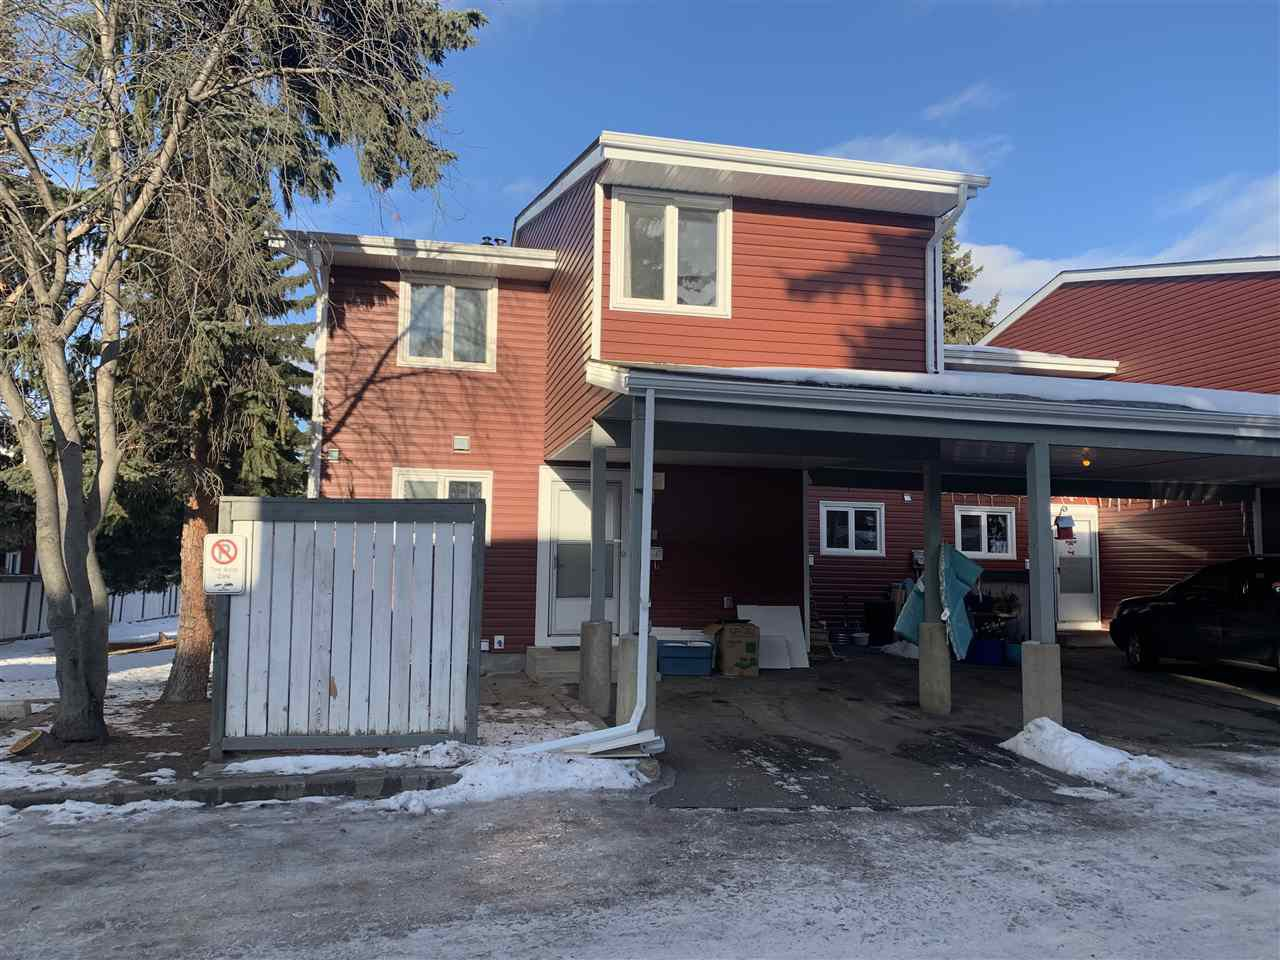 Main Photo: 15 1904 48 Street in Edmonton: Zone 29 Townhouse for sale : MLS®# E4223113